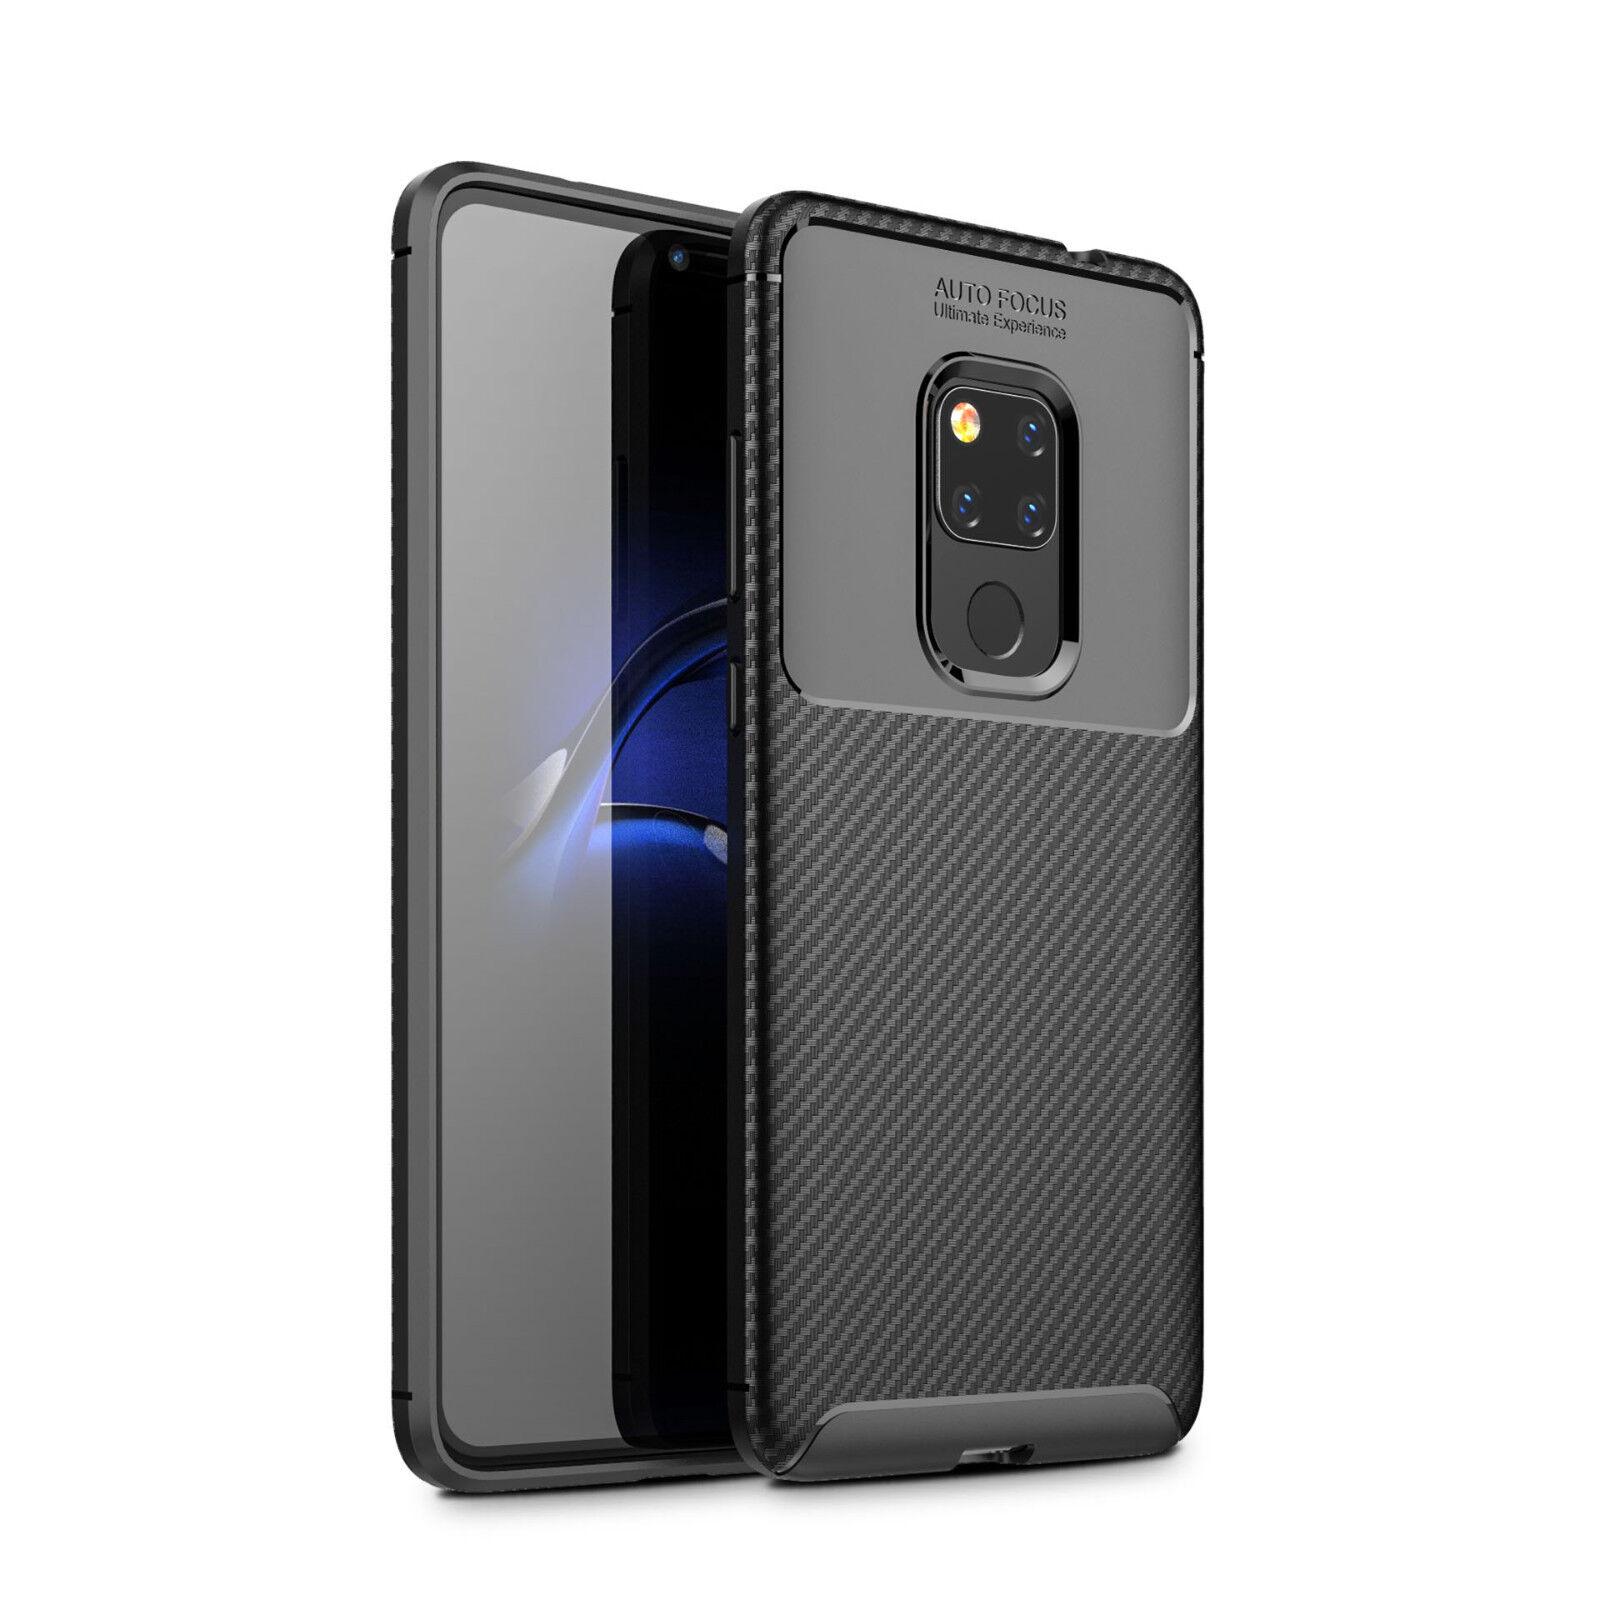 Handy Hülle für Huawei Mate 20 Karbondesign Case Schale TPU dünn schwarz Mate20